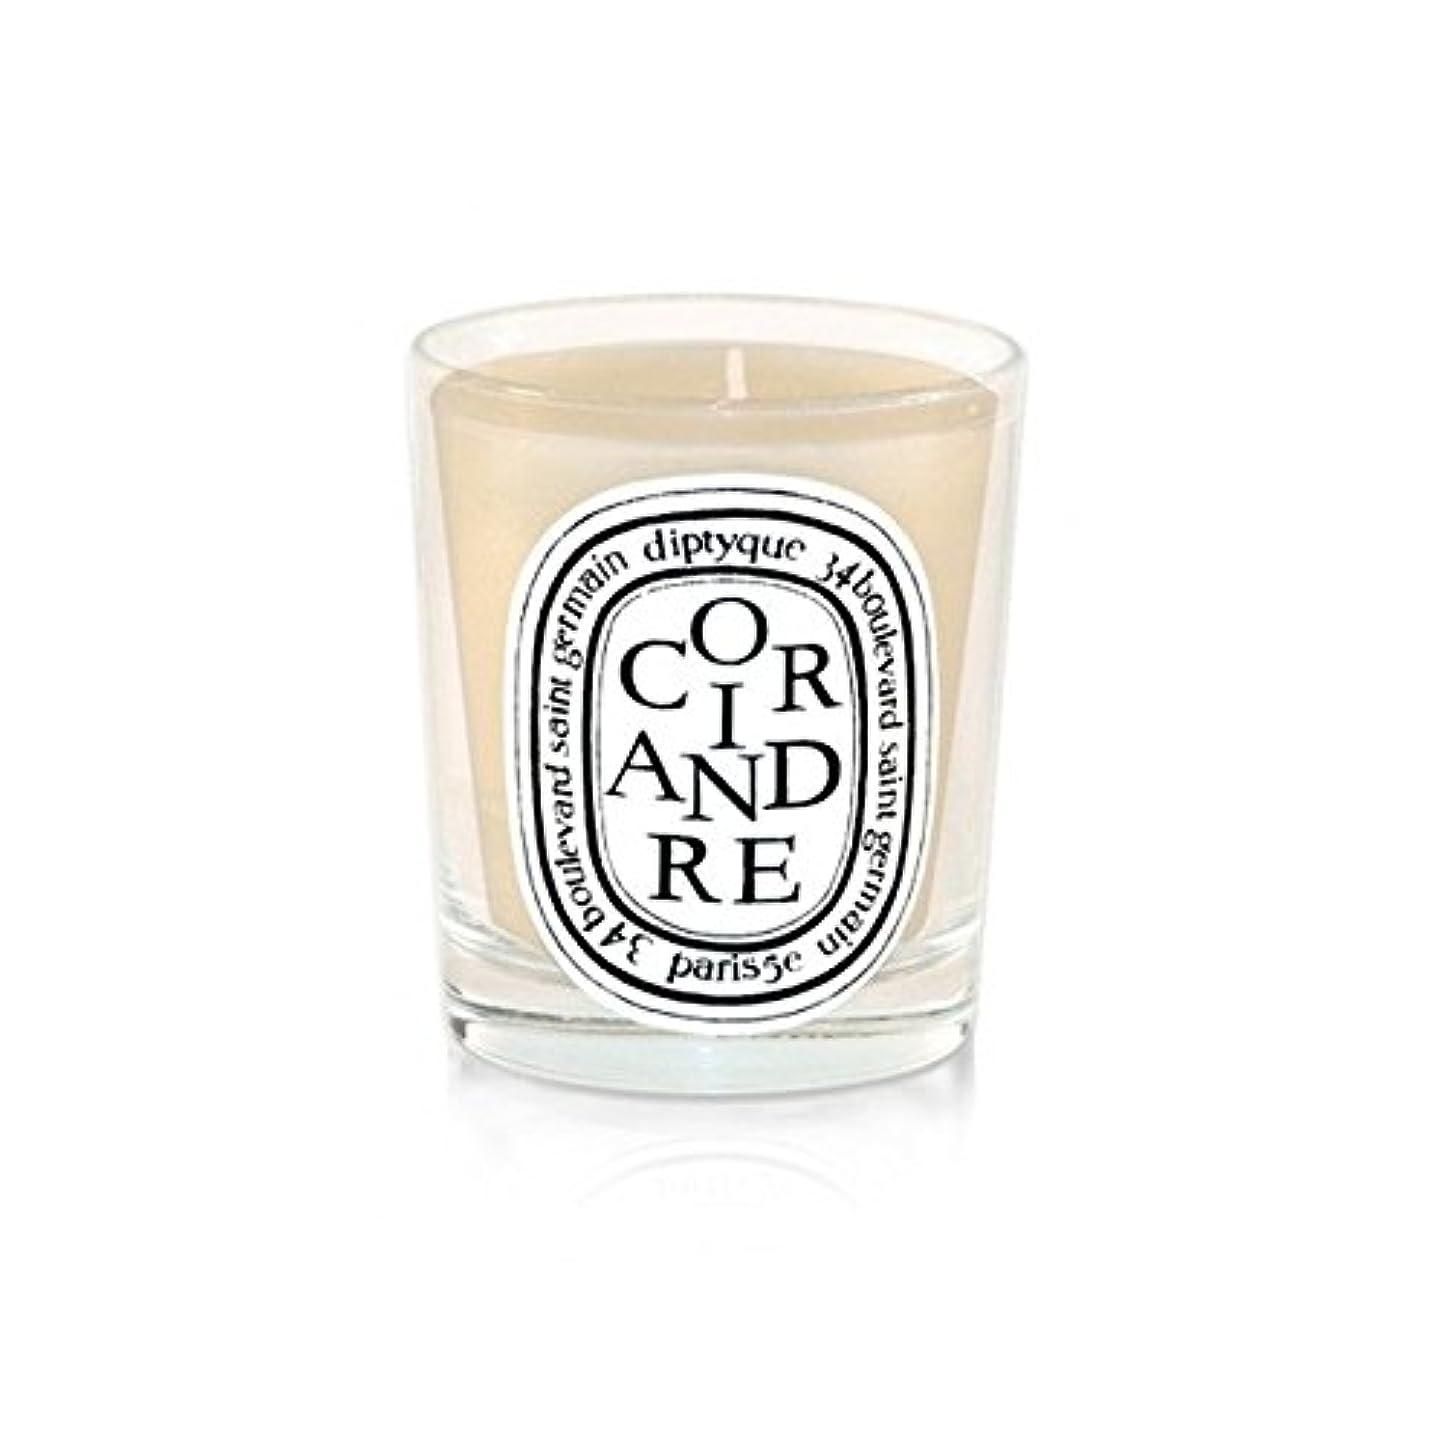 DiptyqueキャンドルCoriandre /コリアンダー190グラム - Diptyque Candle Coriandre / Coriander 190g (Diptyque) [並行輸入品]